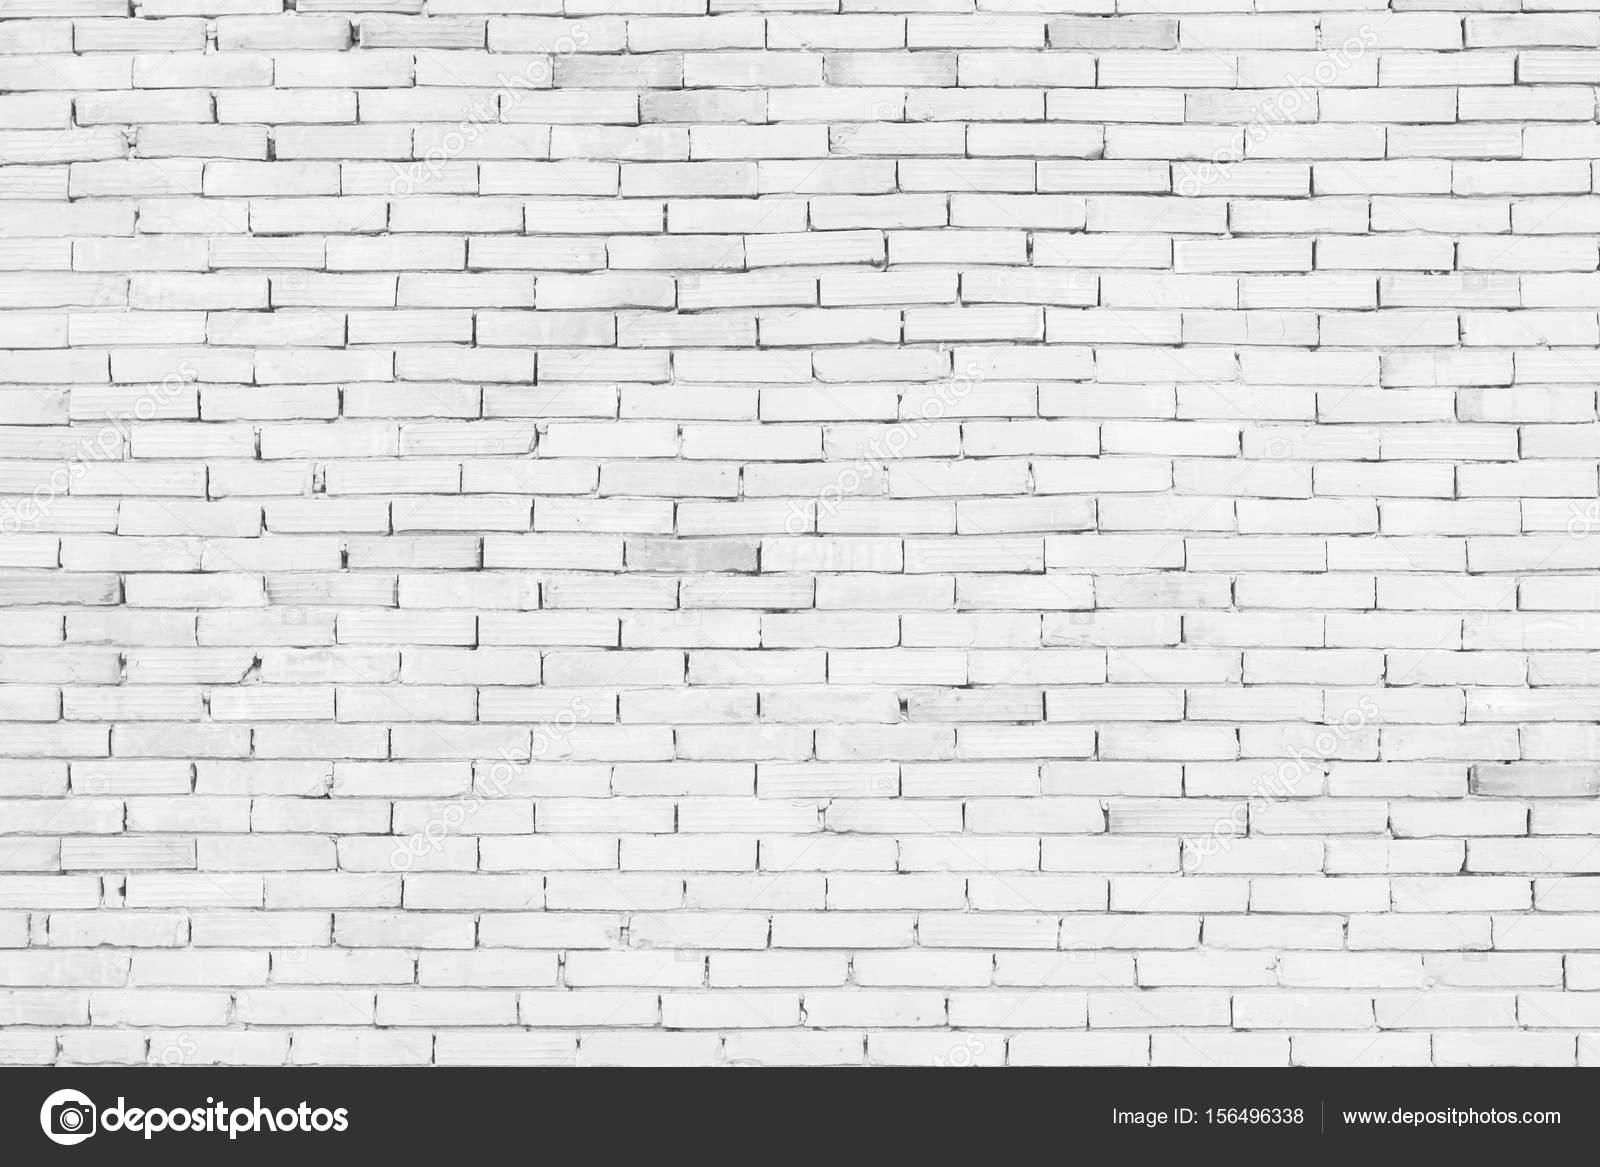 Black And White Brick Wall Texture Background Brick Wallpaper Stock Photo Image By Phokin2516 Gmail Com 156496338